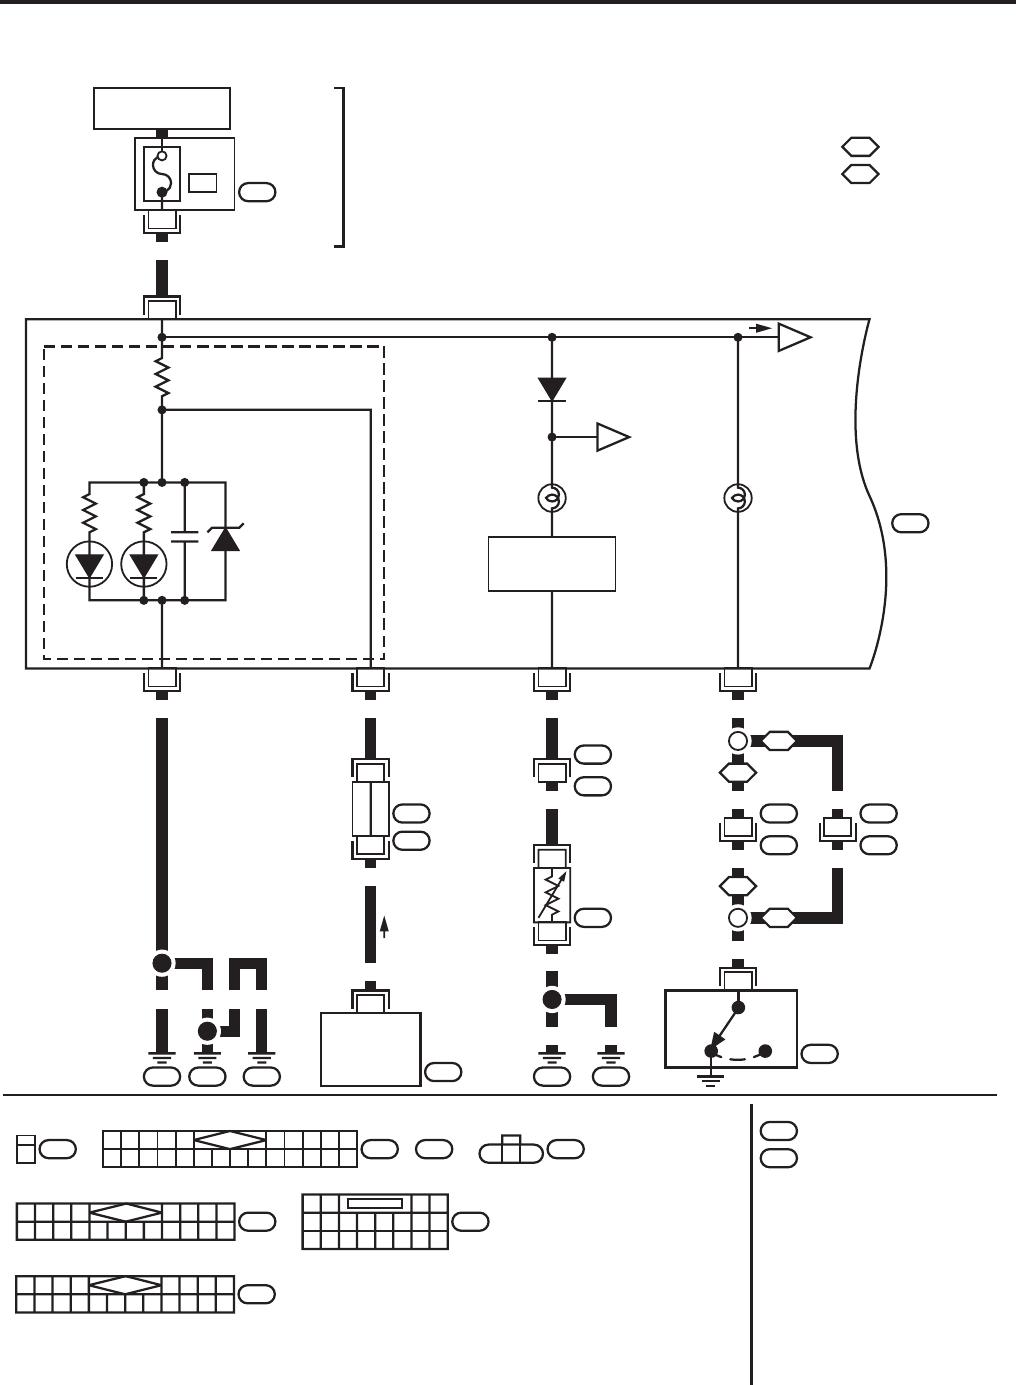 Groovy Nissan Qg18De Wiring Diagram Wiring Library Wiring Cloud Uslyletkolfr09Org